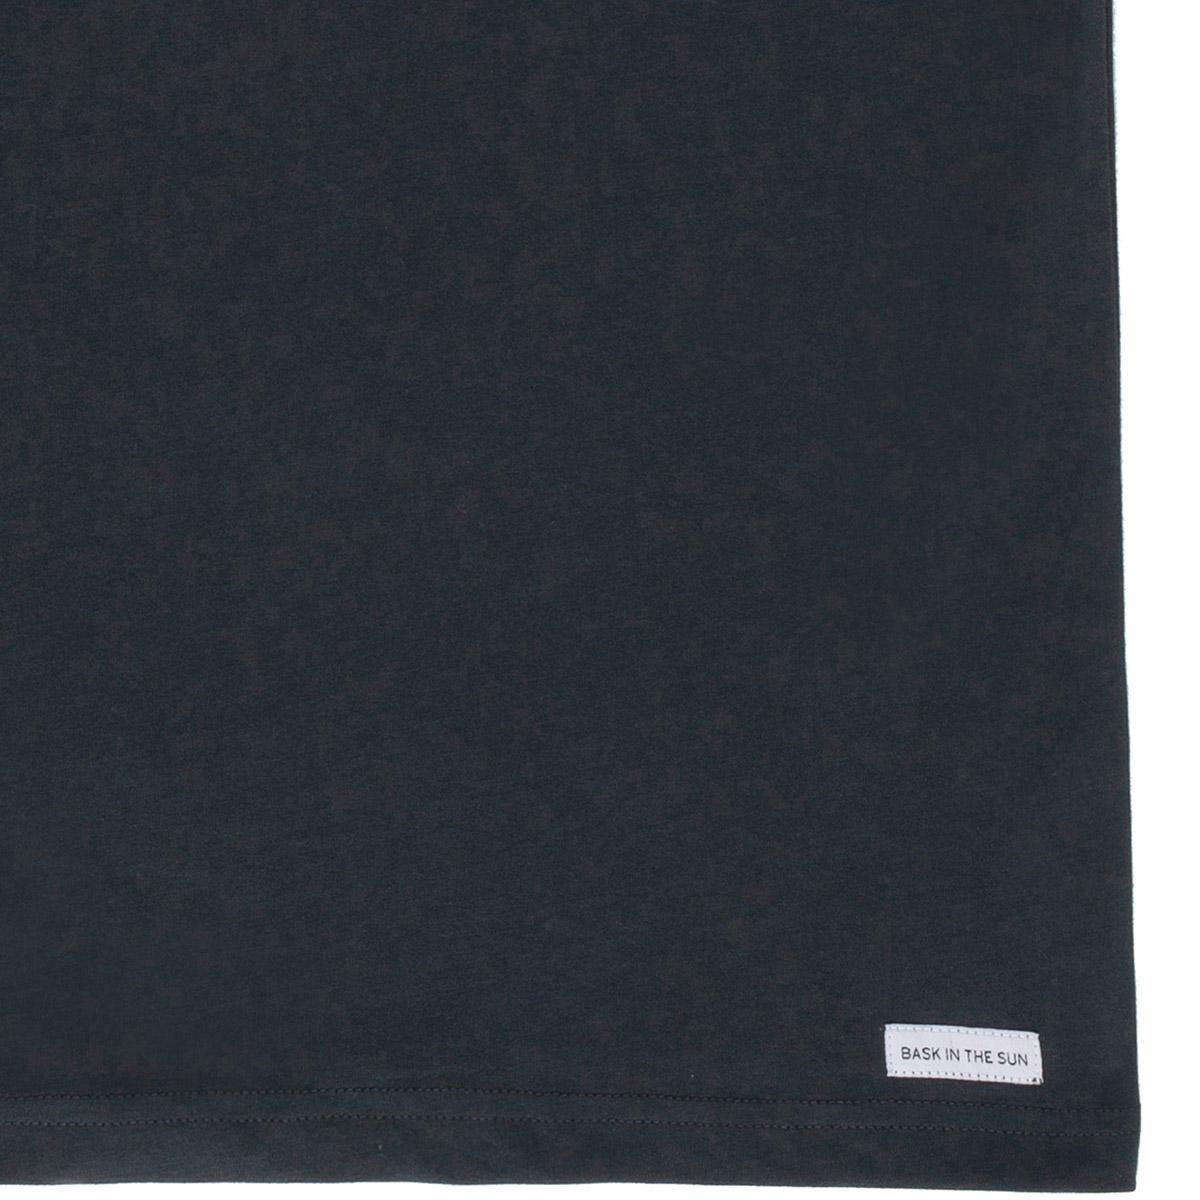 T-shirt en coton bio black radio cetace - Bask in the Sun num 3